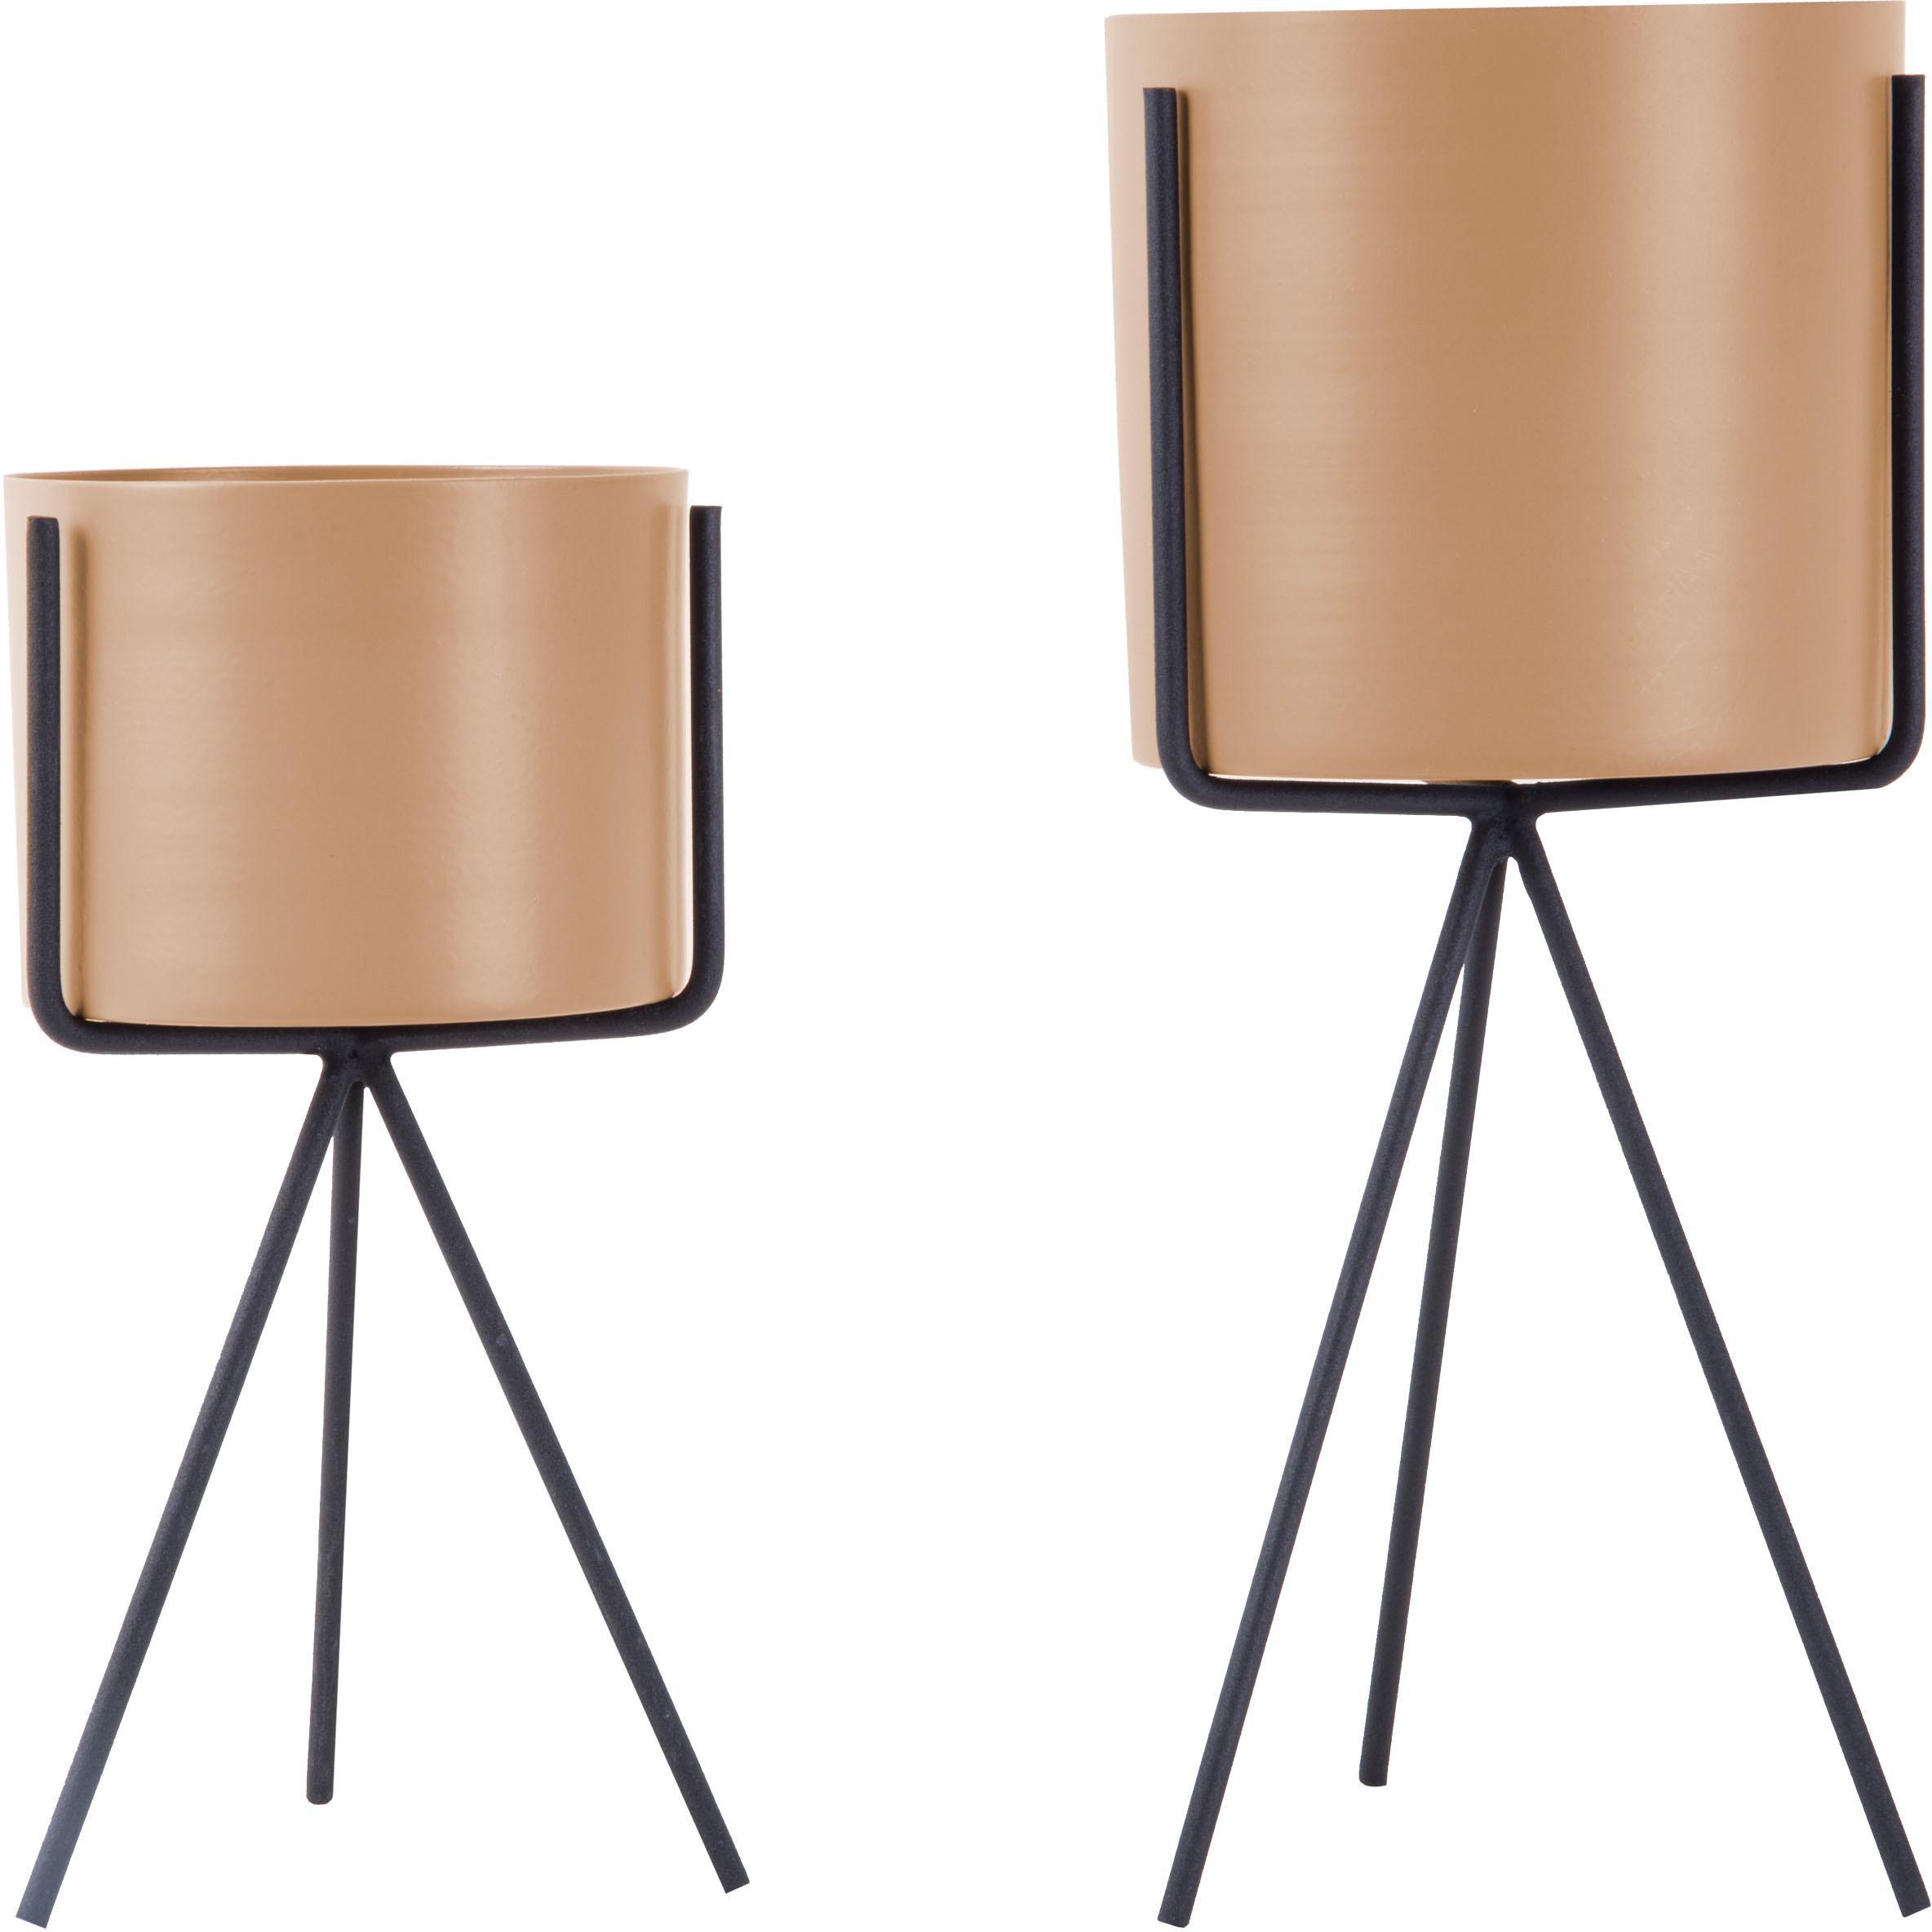 Set 2 portavasi Pedestal, Metallo rivestito, Sabbia, nero, Ø 13 x Alt. 30 cm